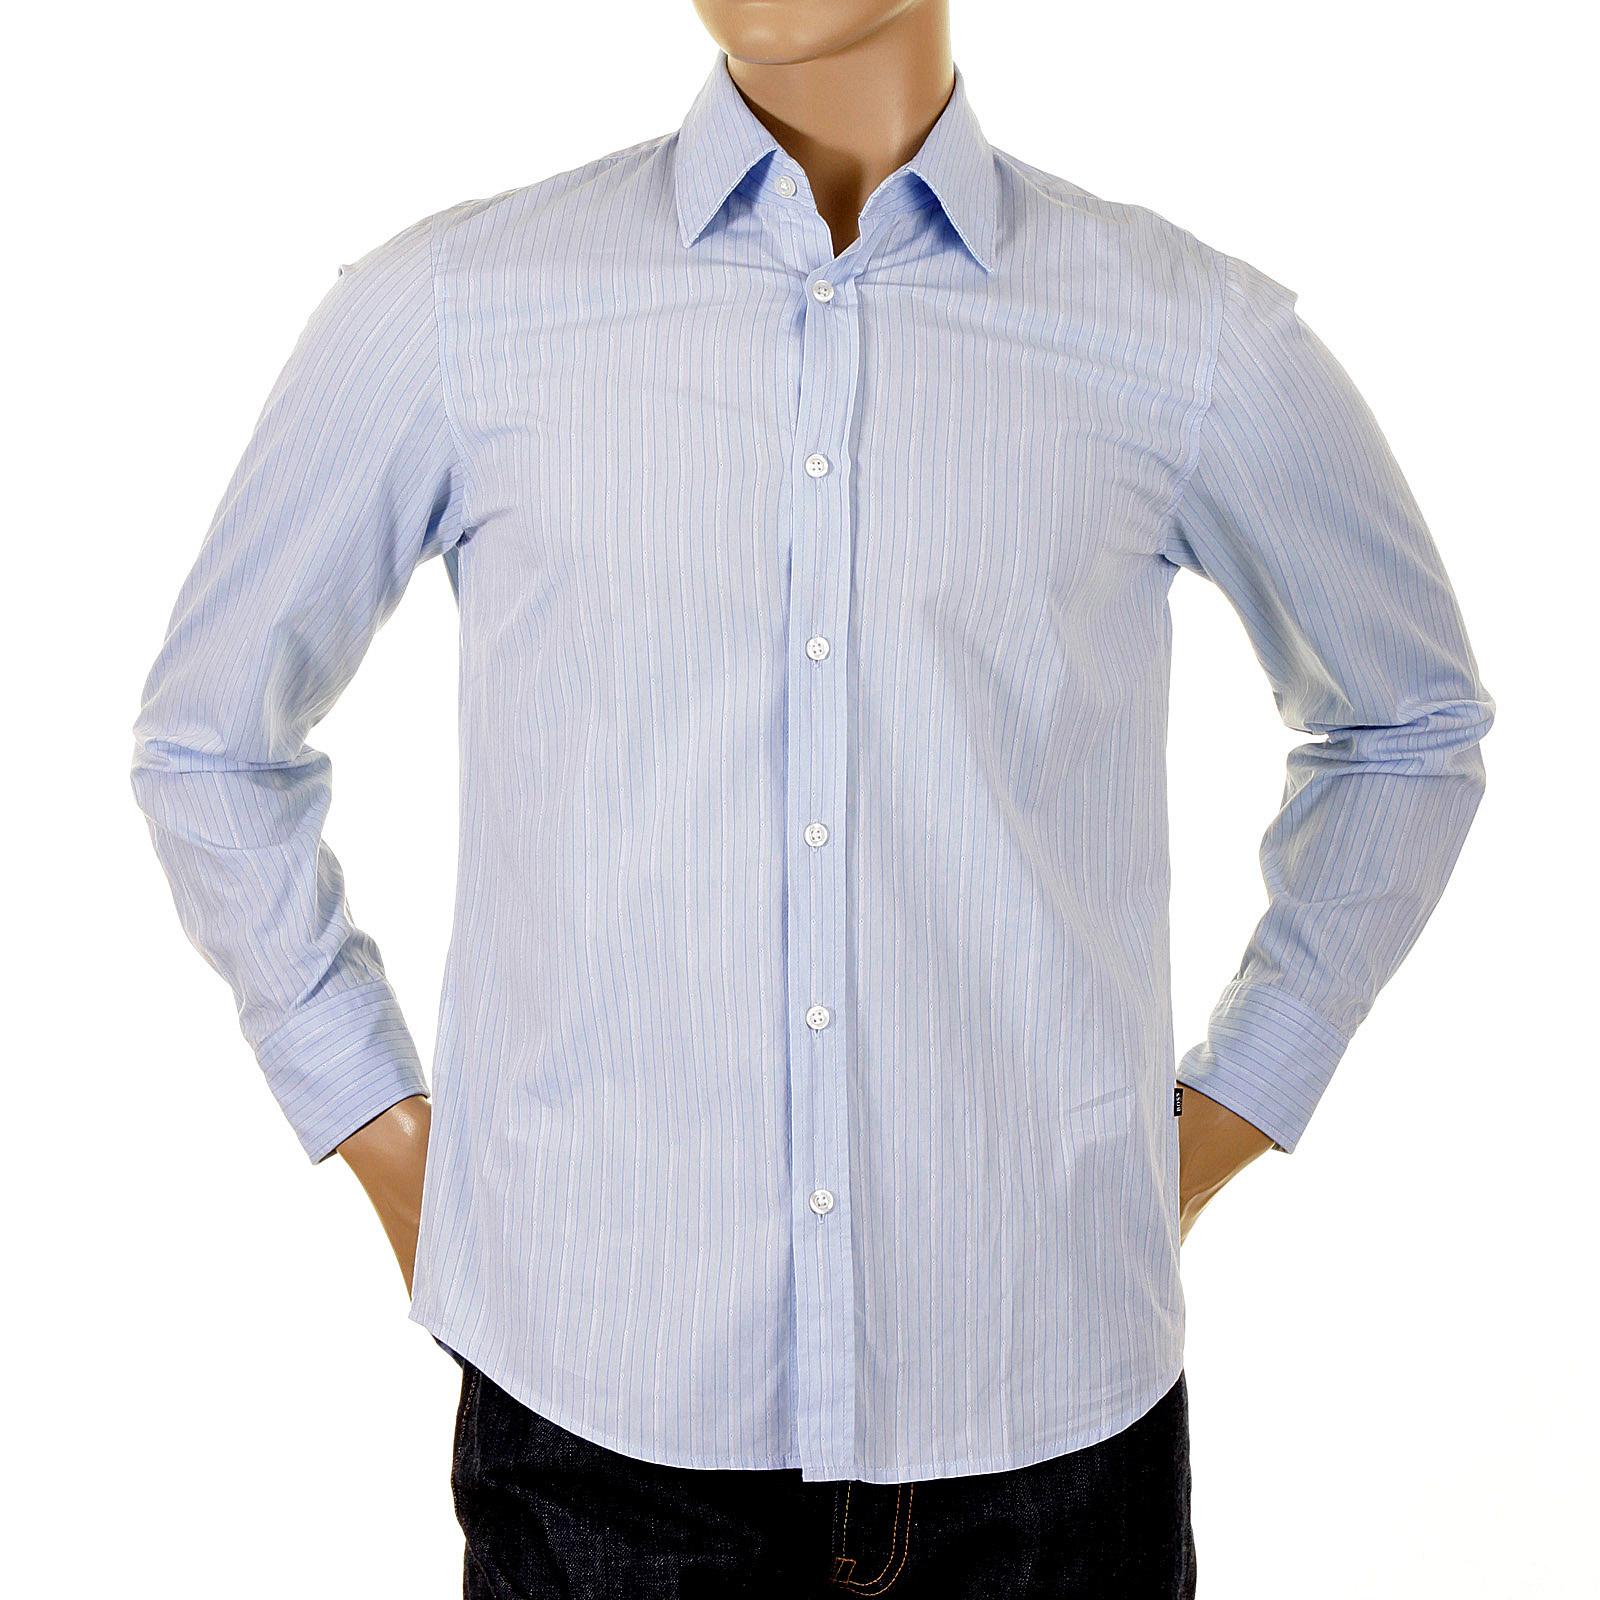 Hugo boss shirt lex 02731750 pale blue striped shirt for Hugo boss dress shirts